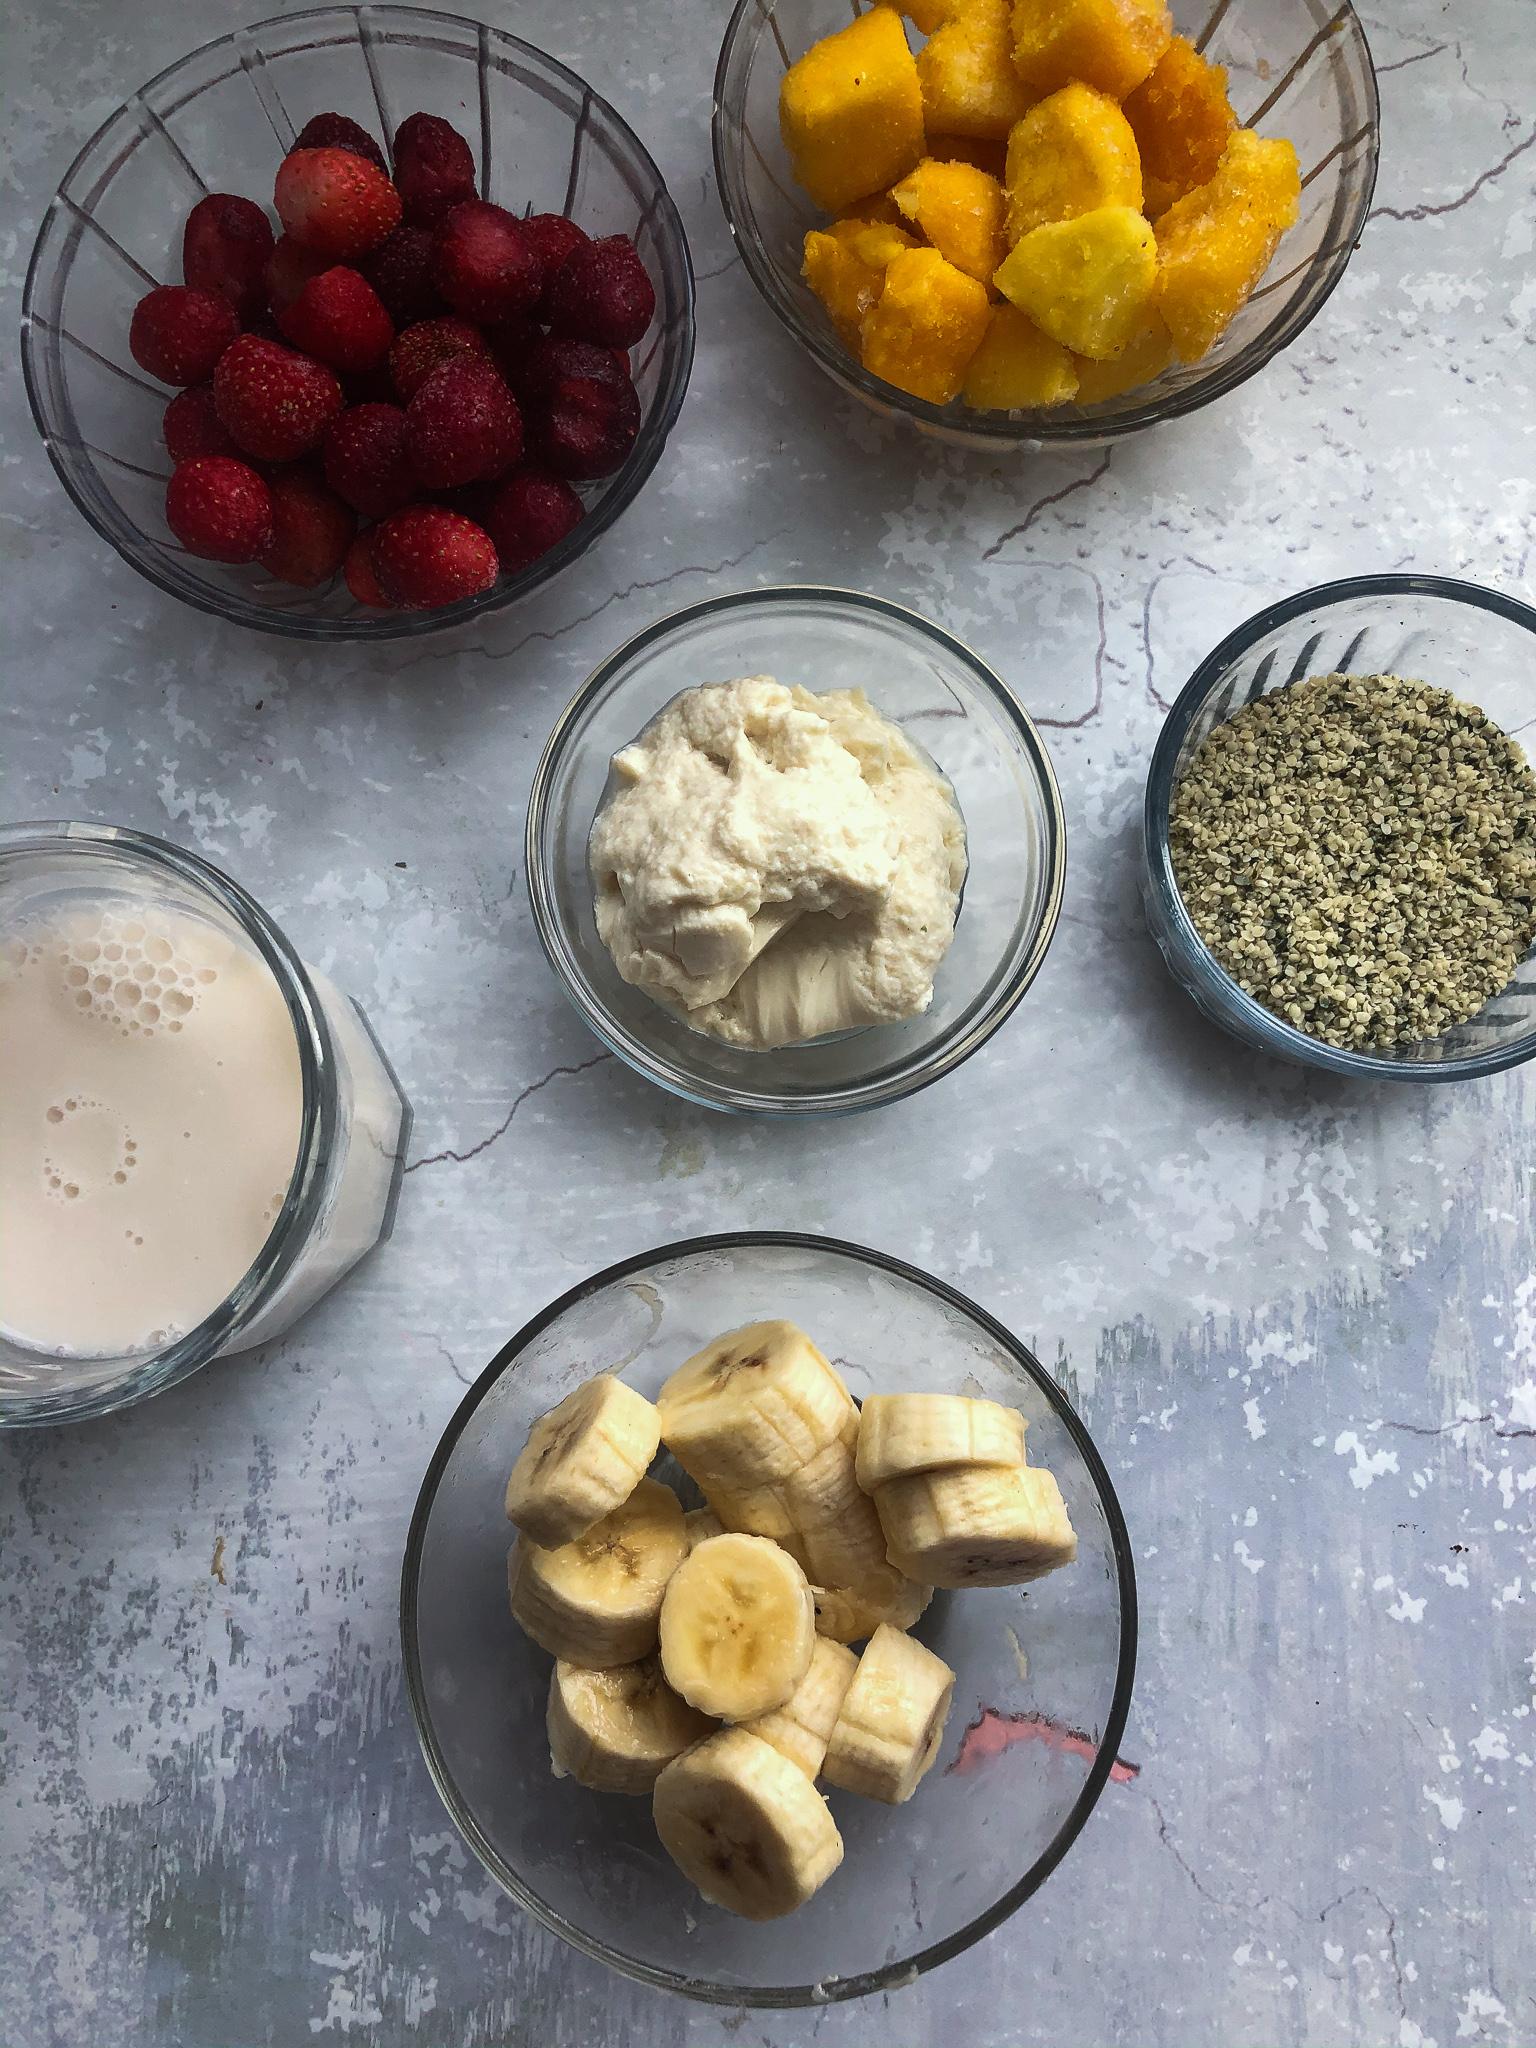 vegan smoothie ingredients